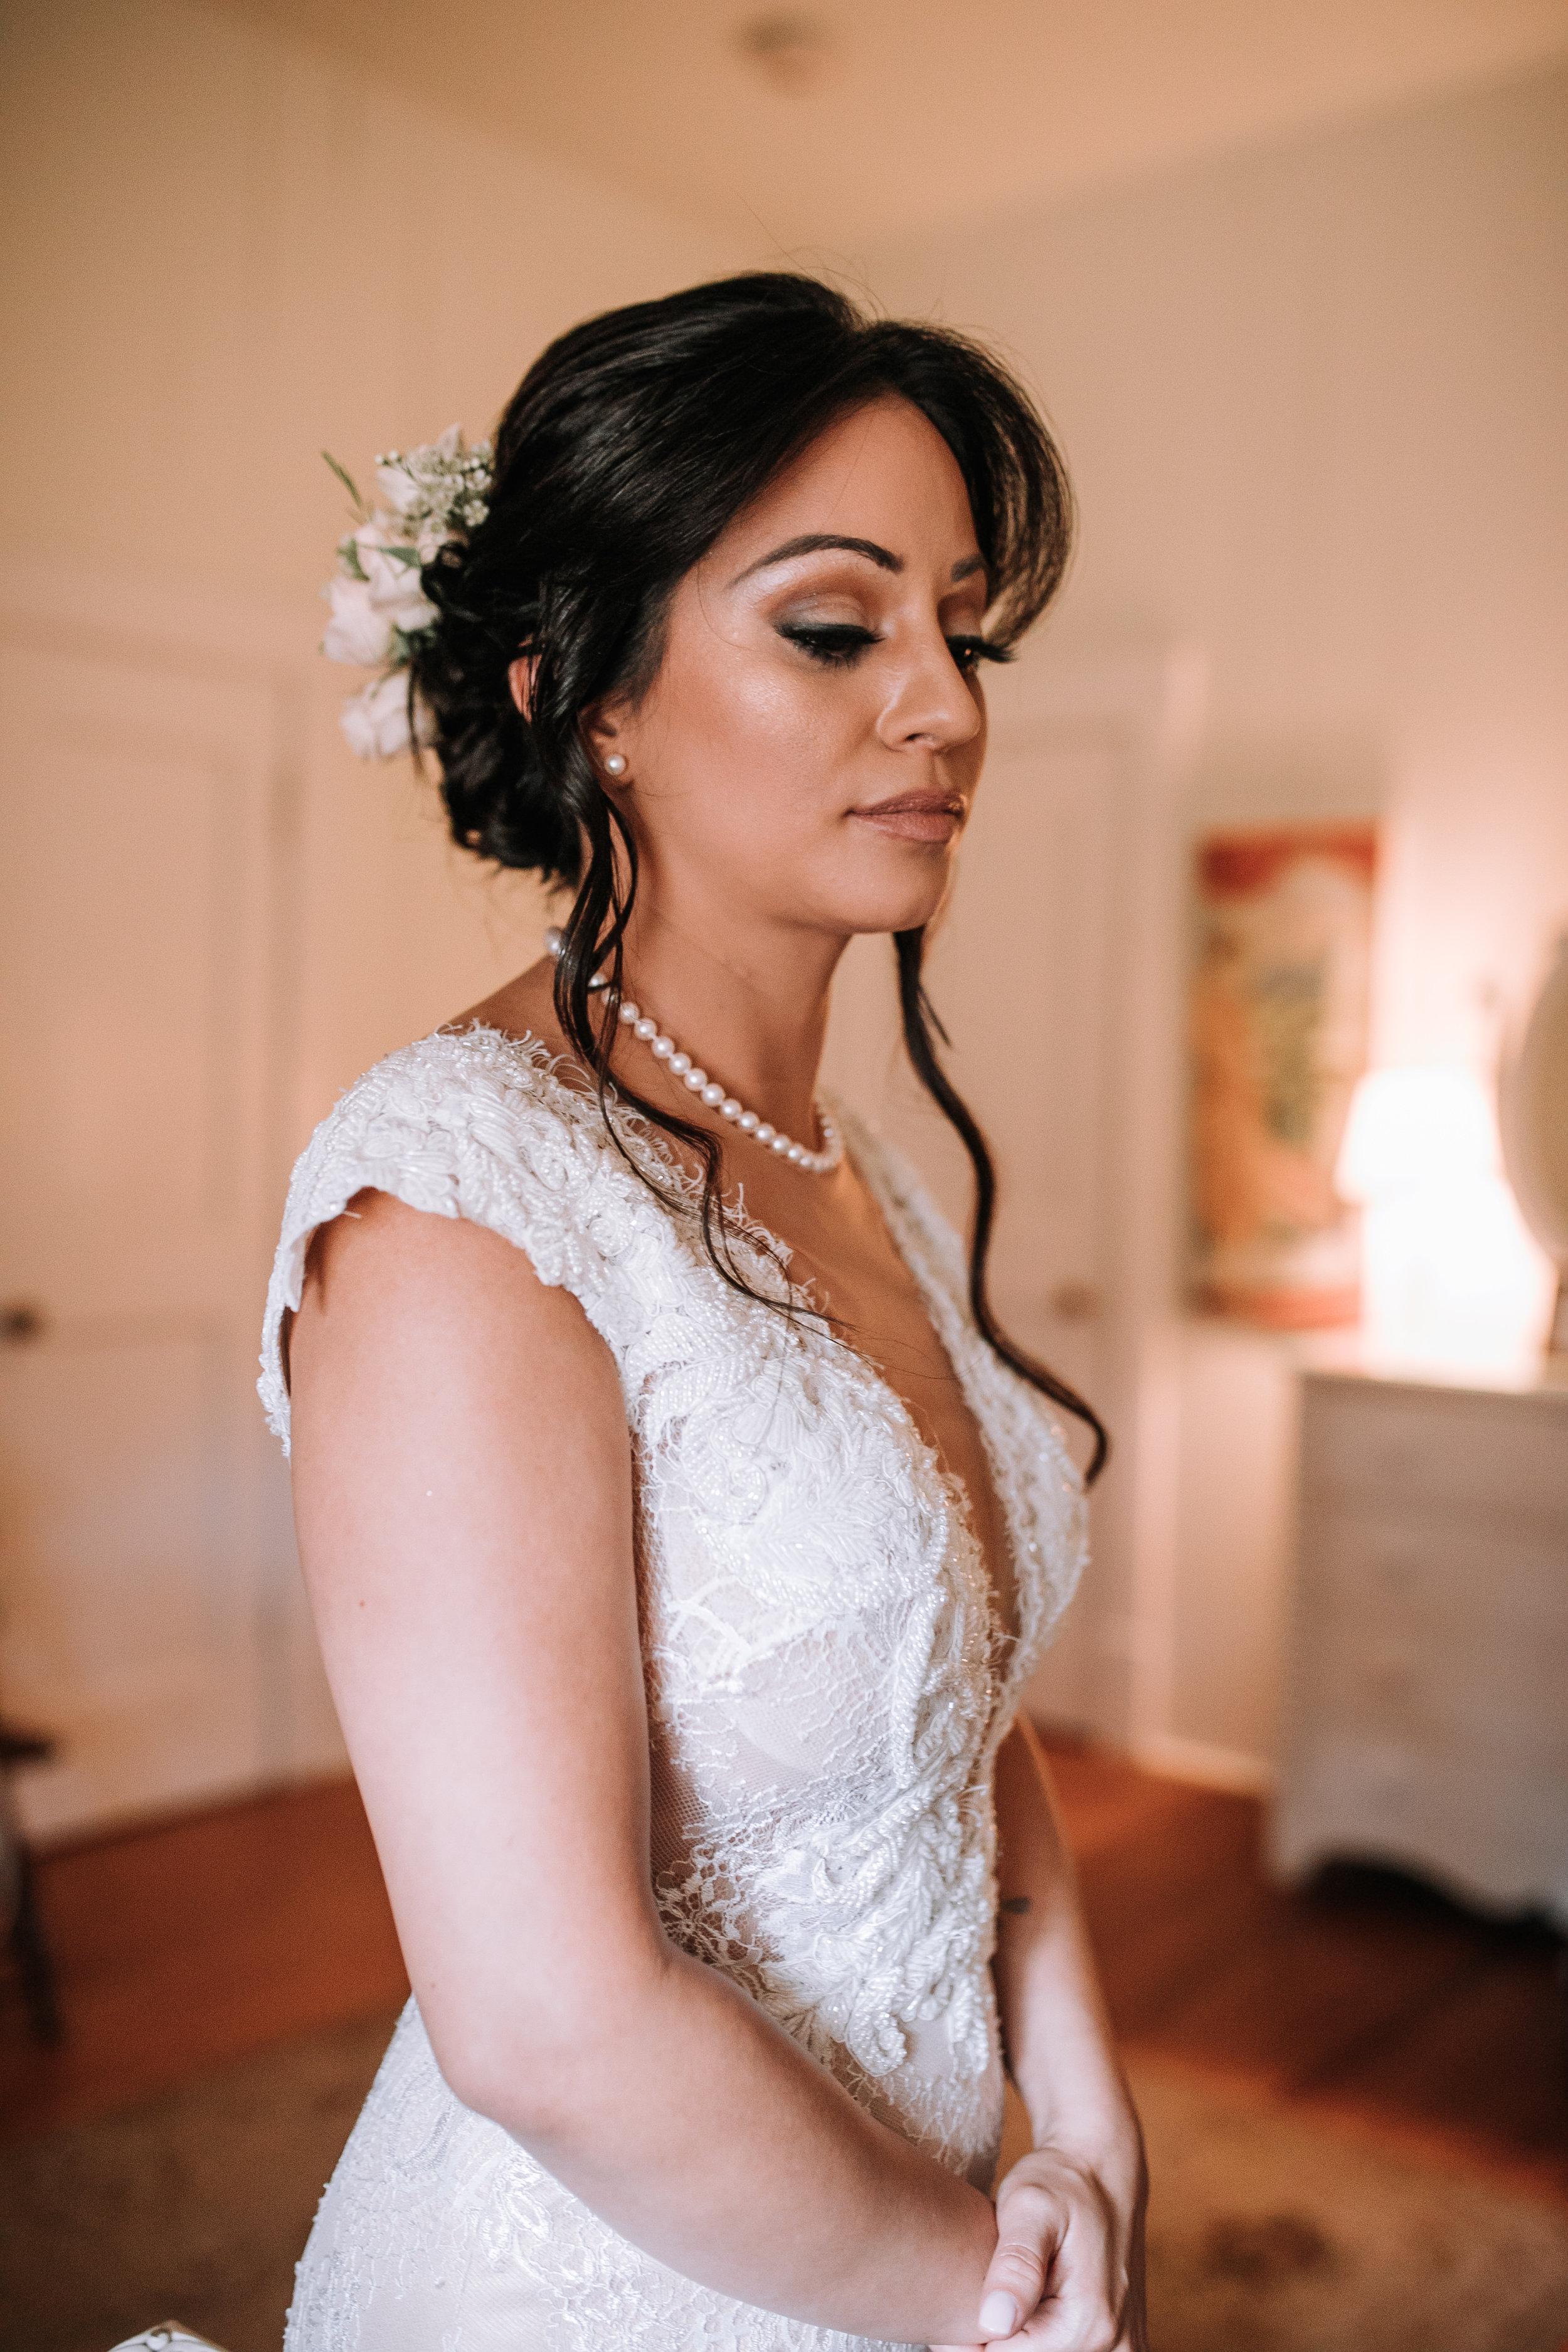 Bonett-House-wedding-fort-lauderdale-florida-Rkm-Photography-30.jpg